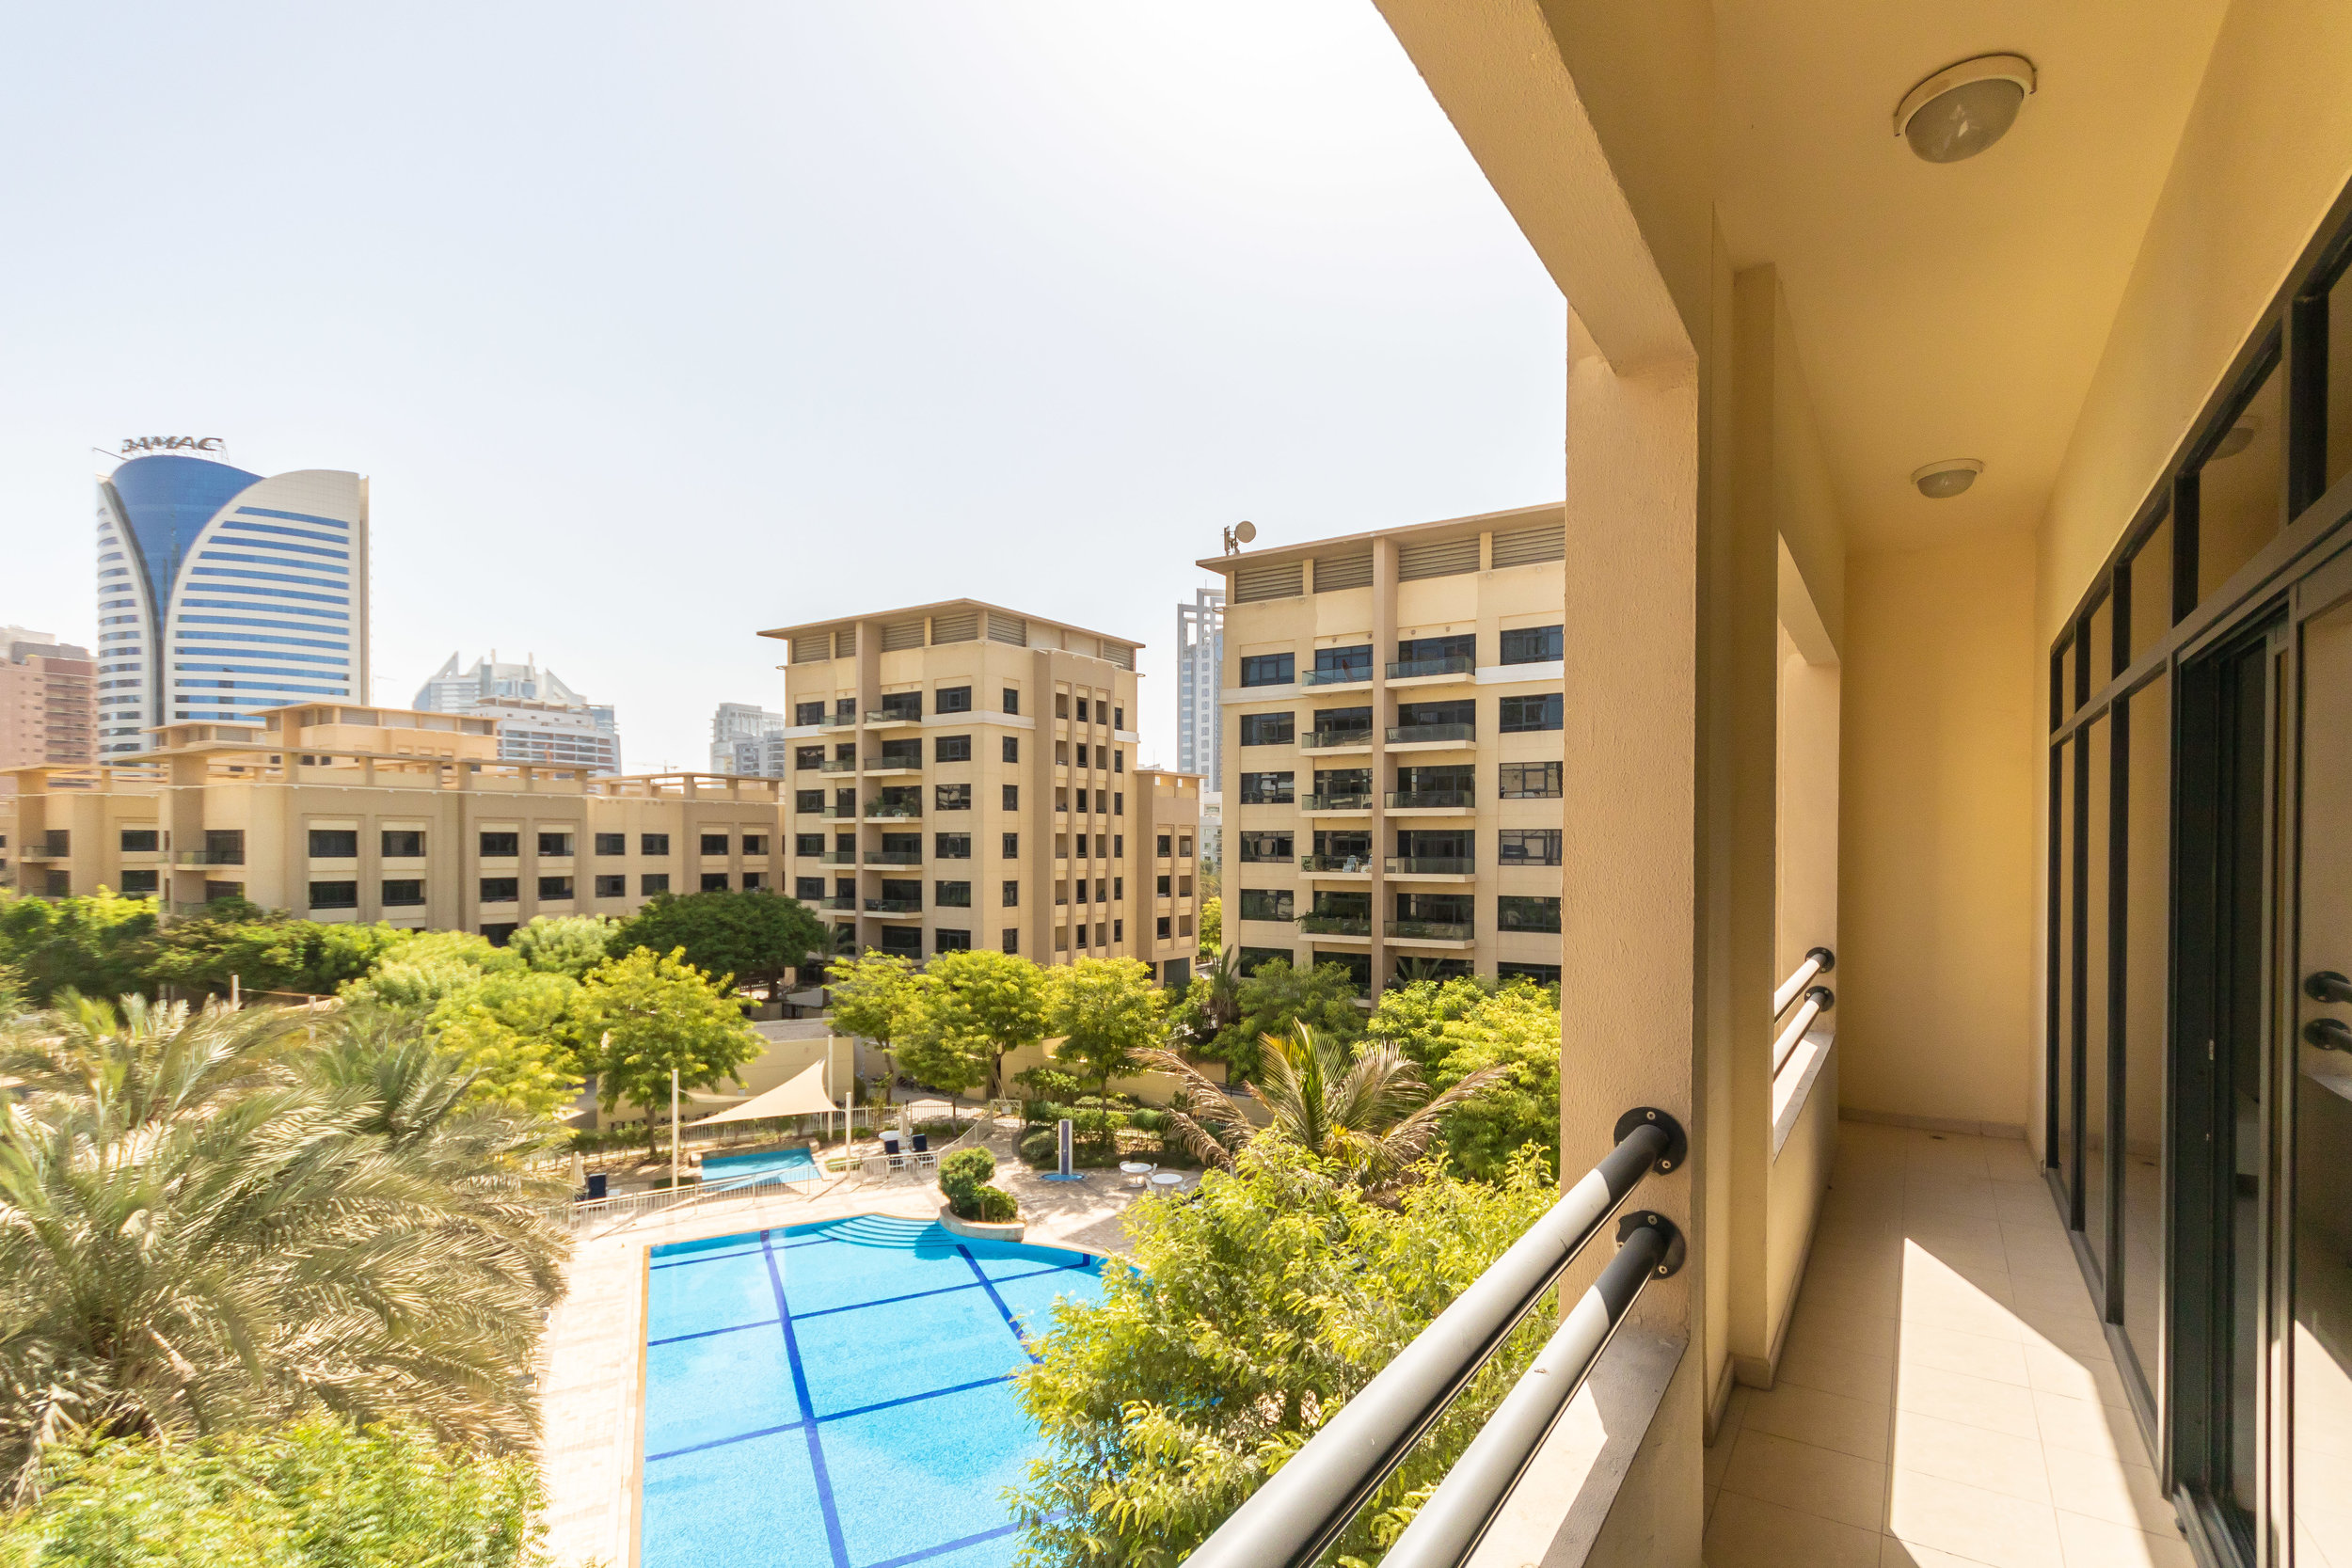 Balcony with beautiful pool view